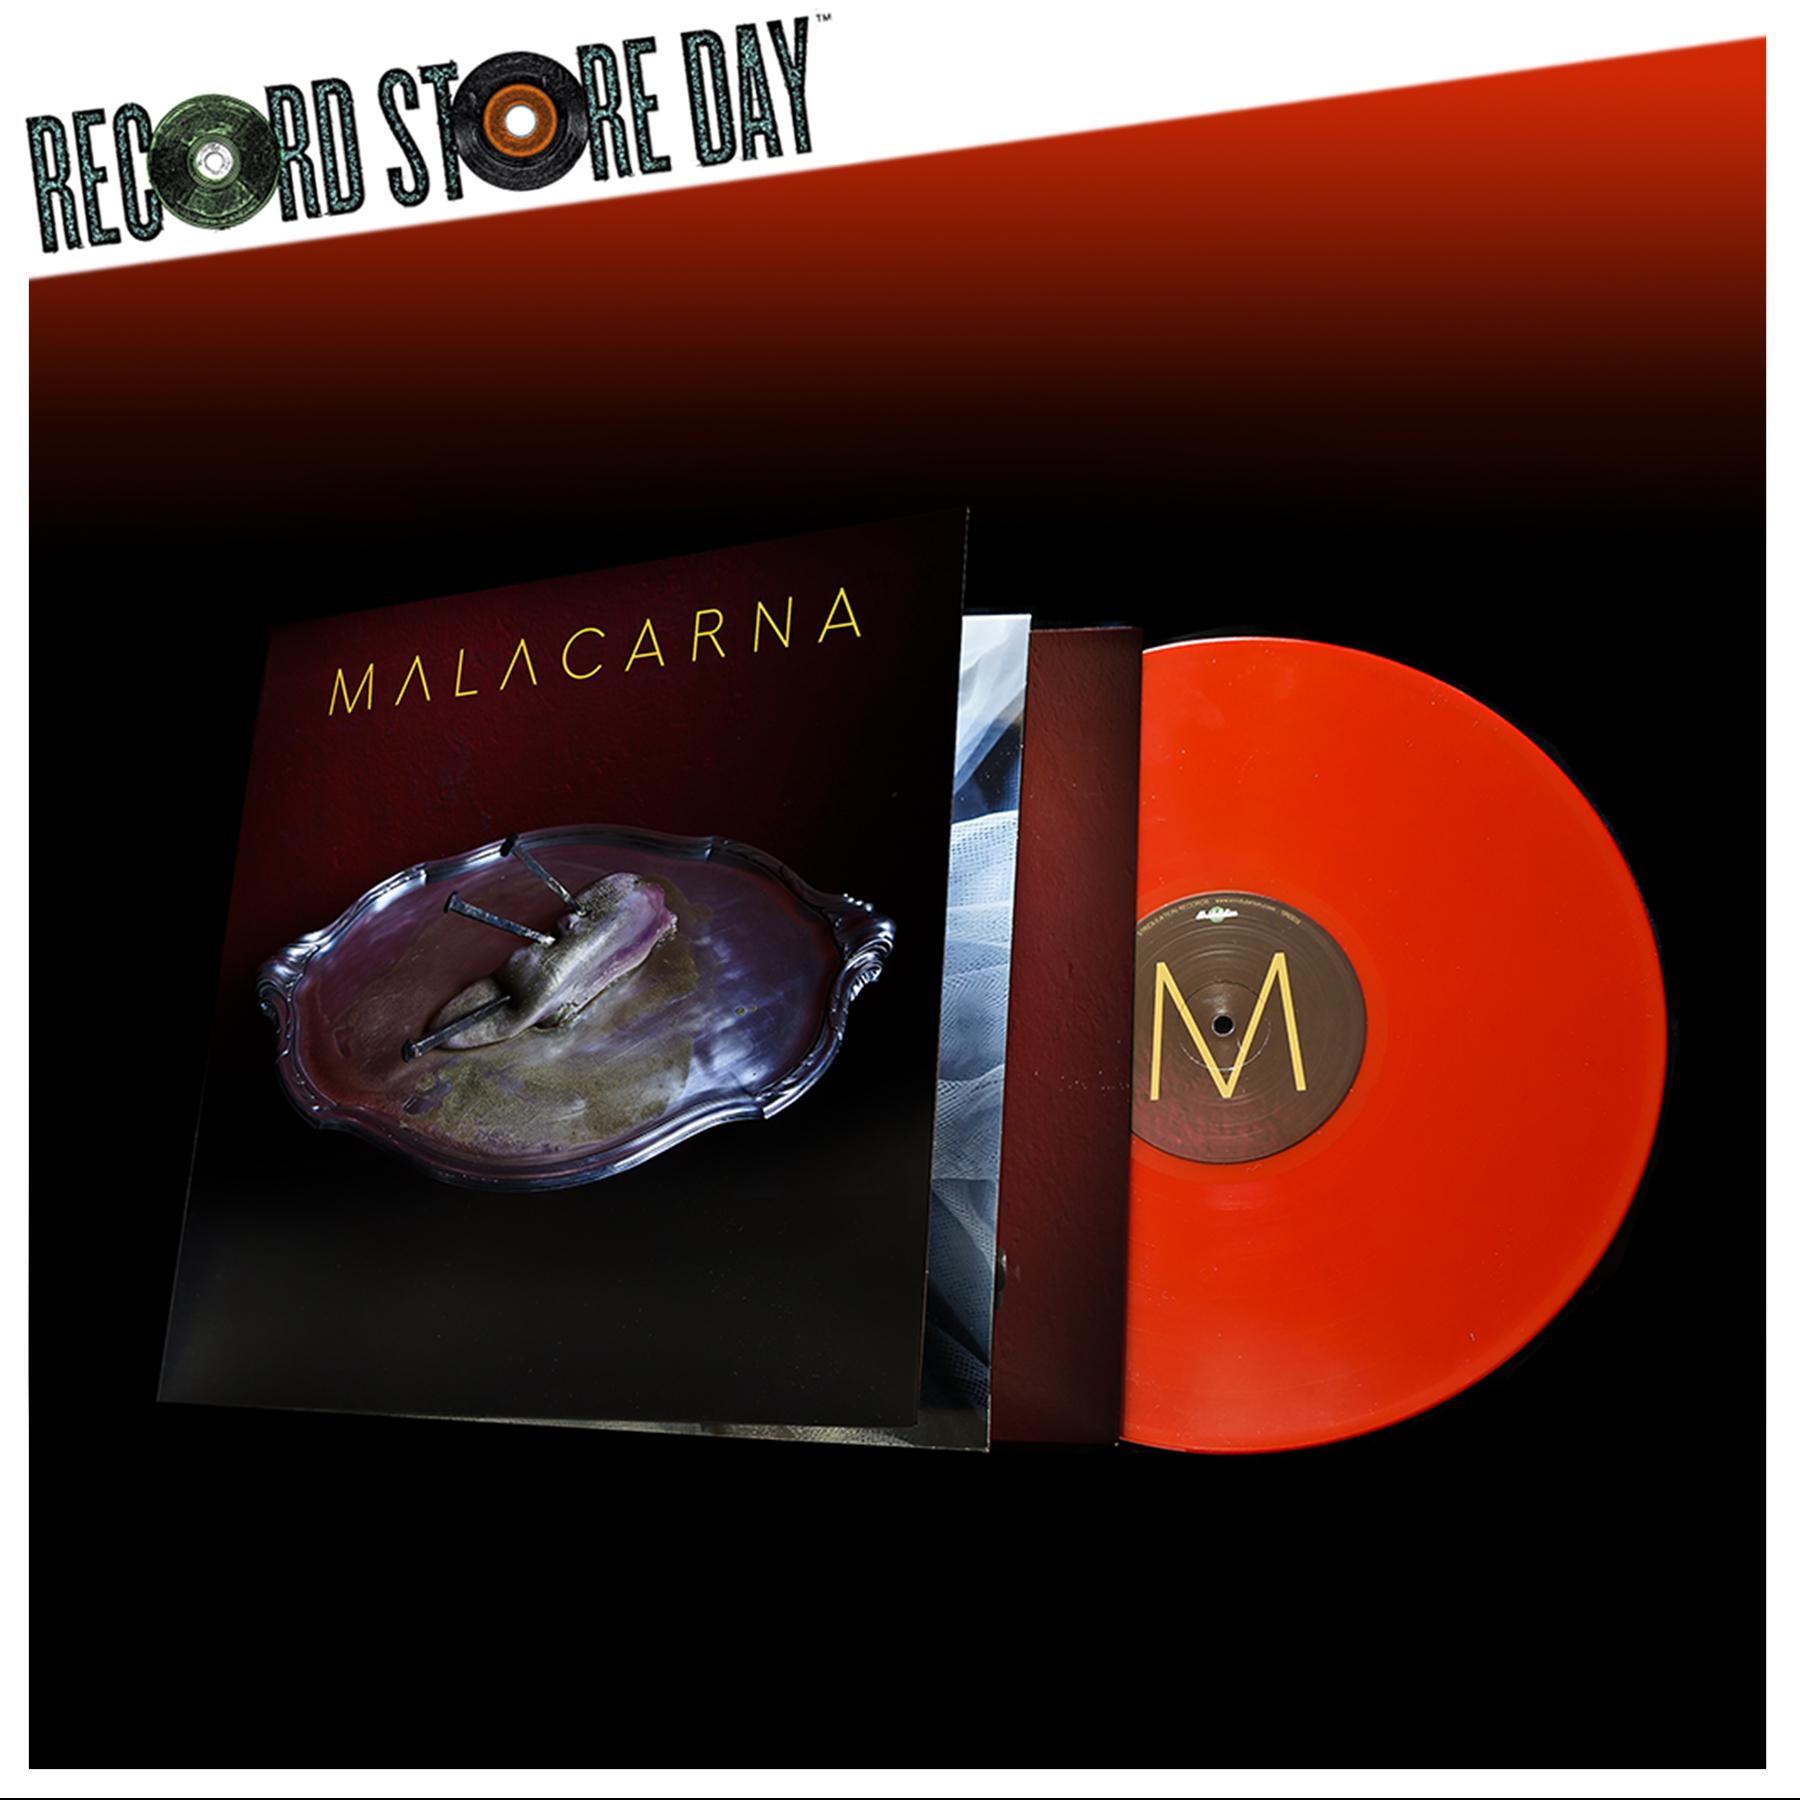 Semm Music Store Record Store Day 2021 Malacarna